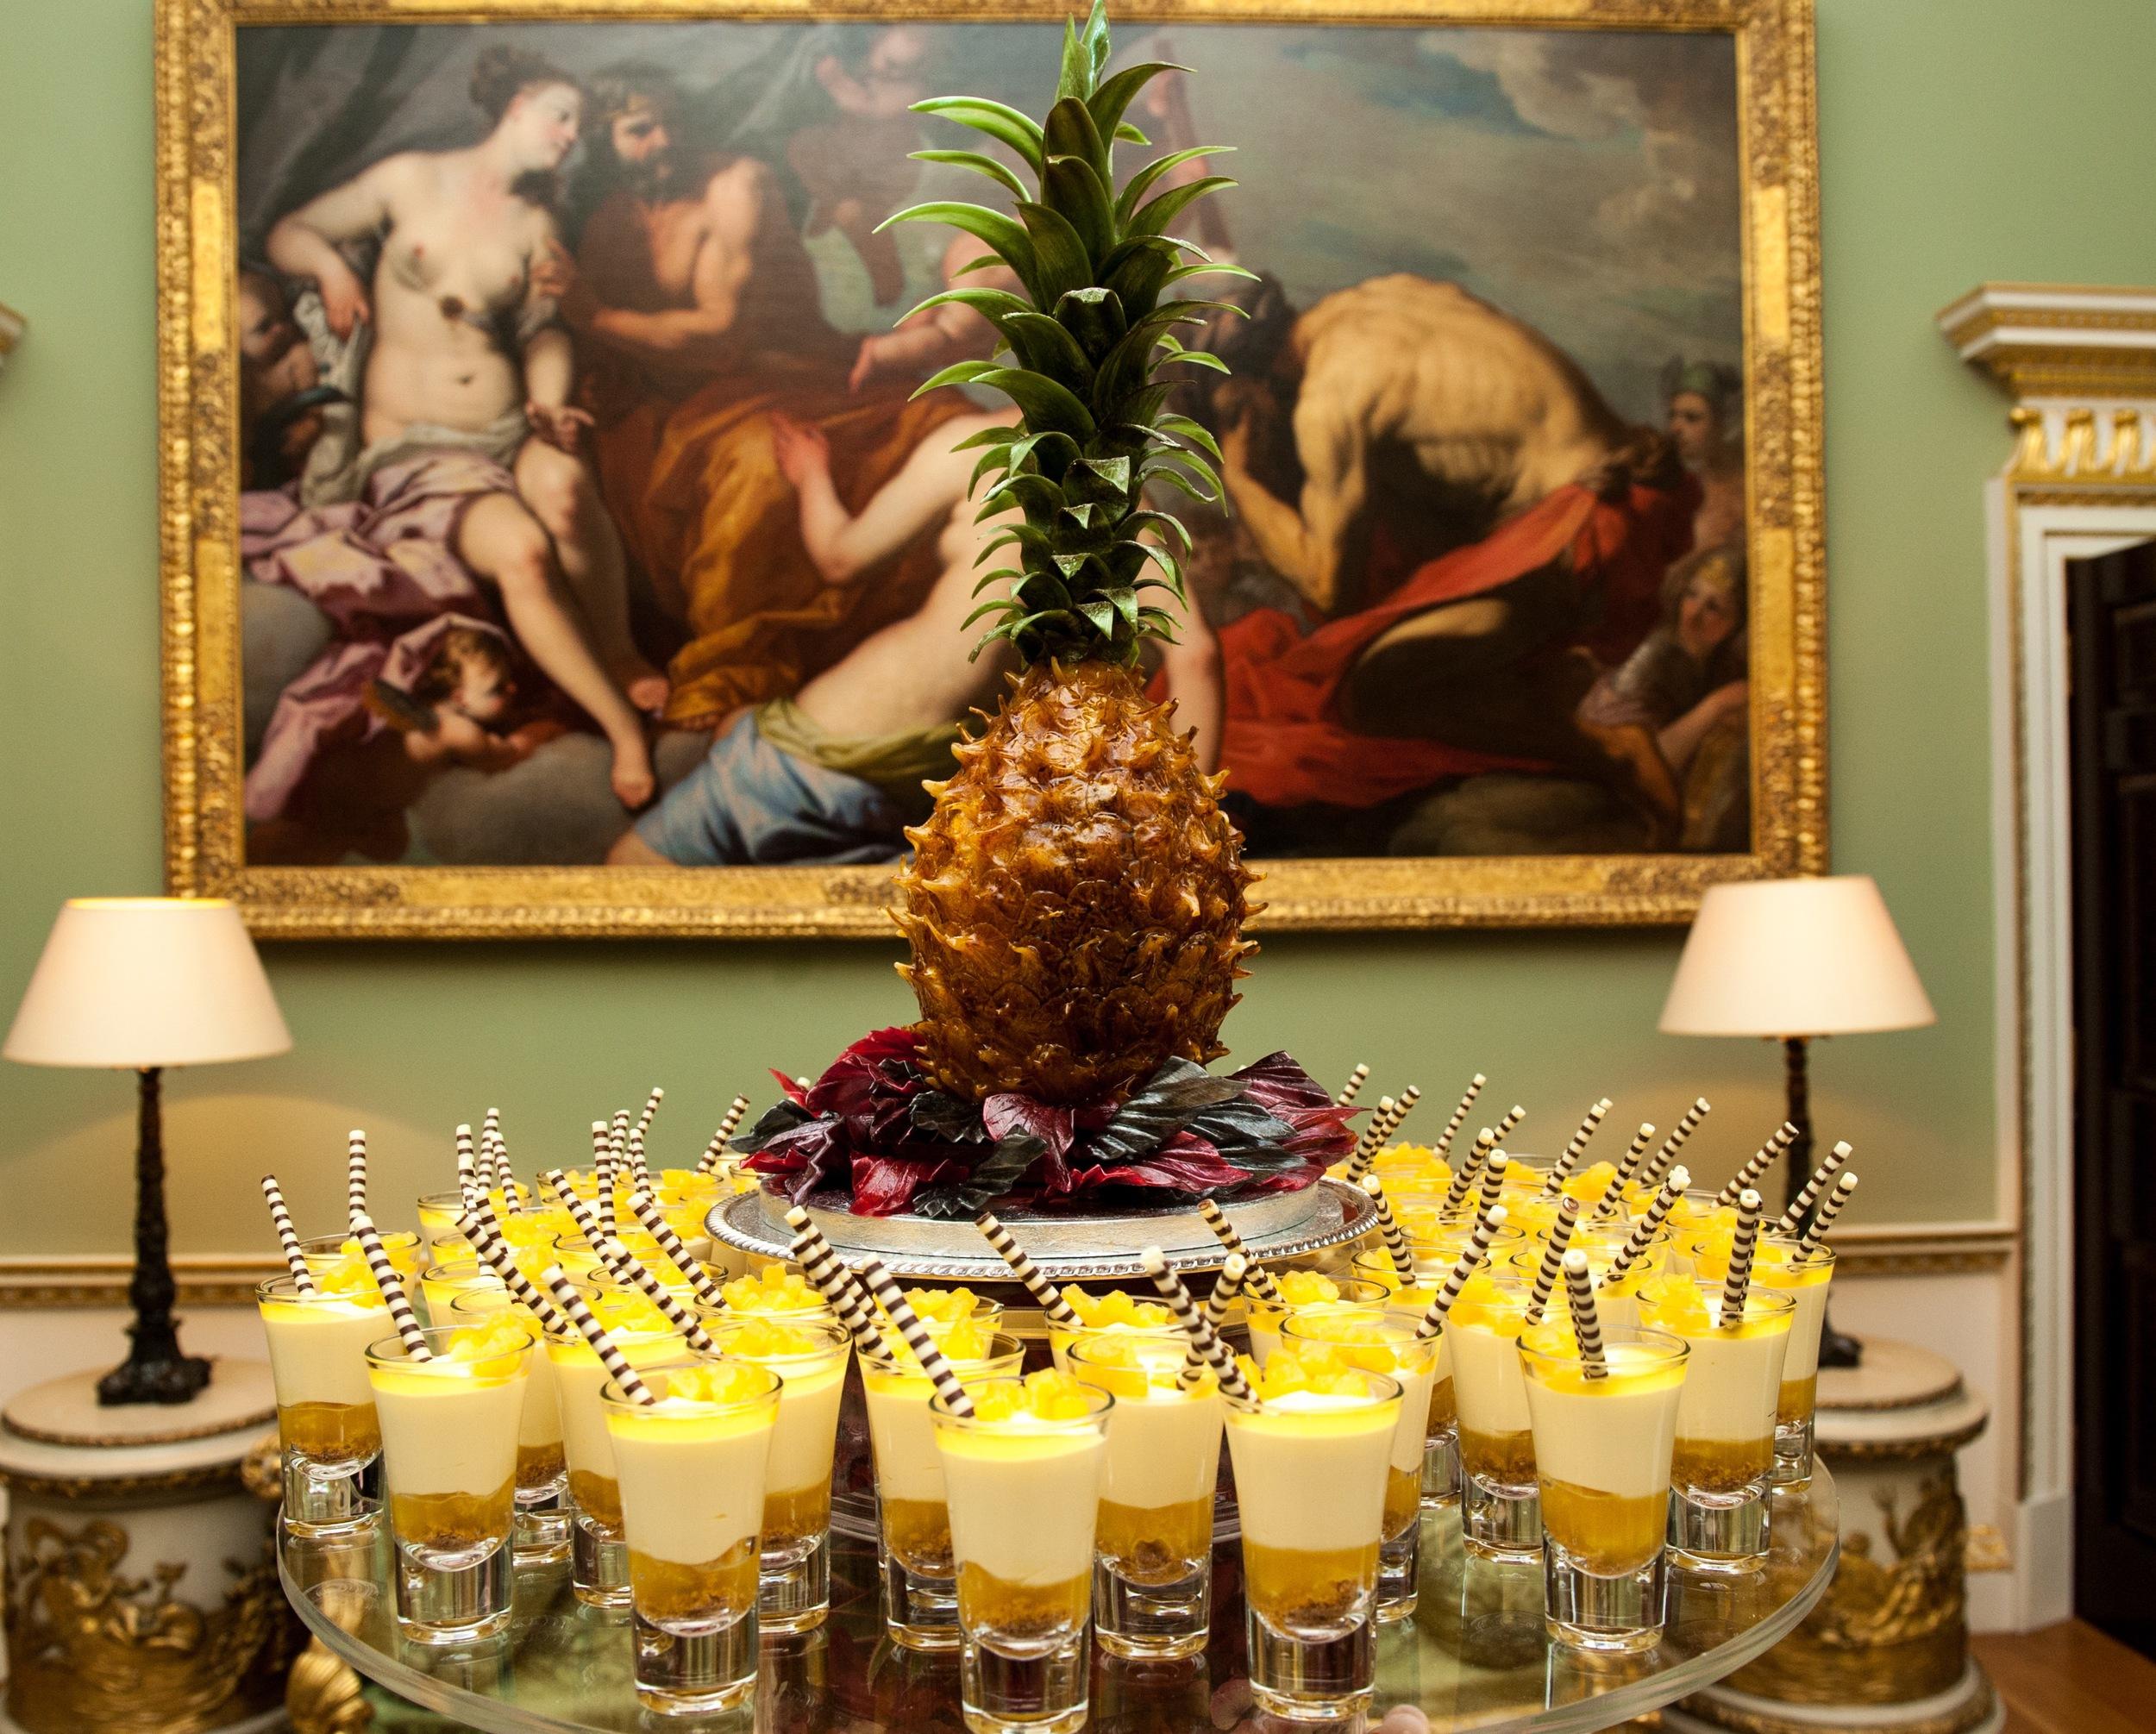 A magnificent spun sugar pineapple centrepiece